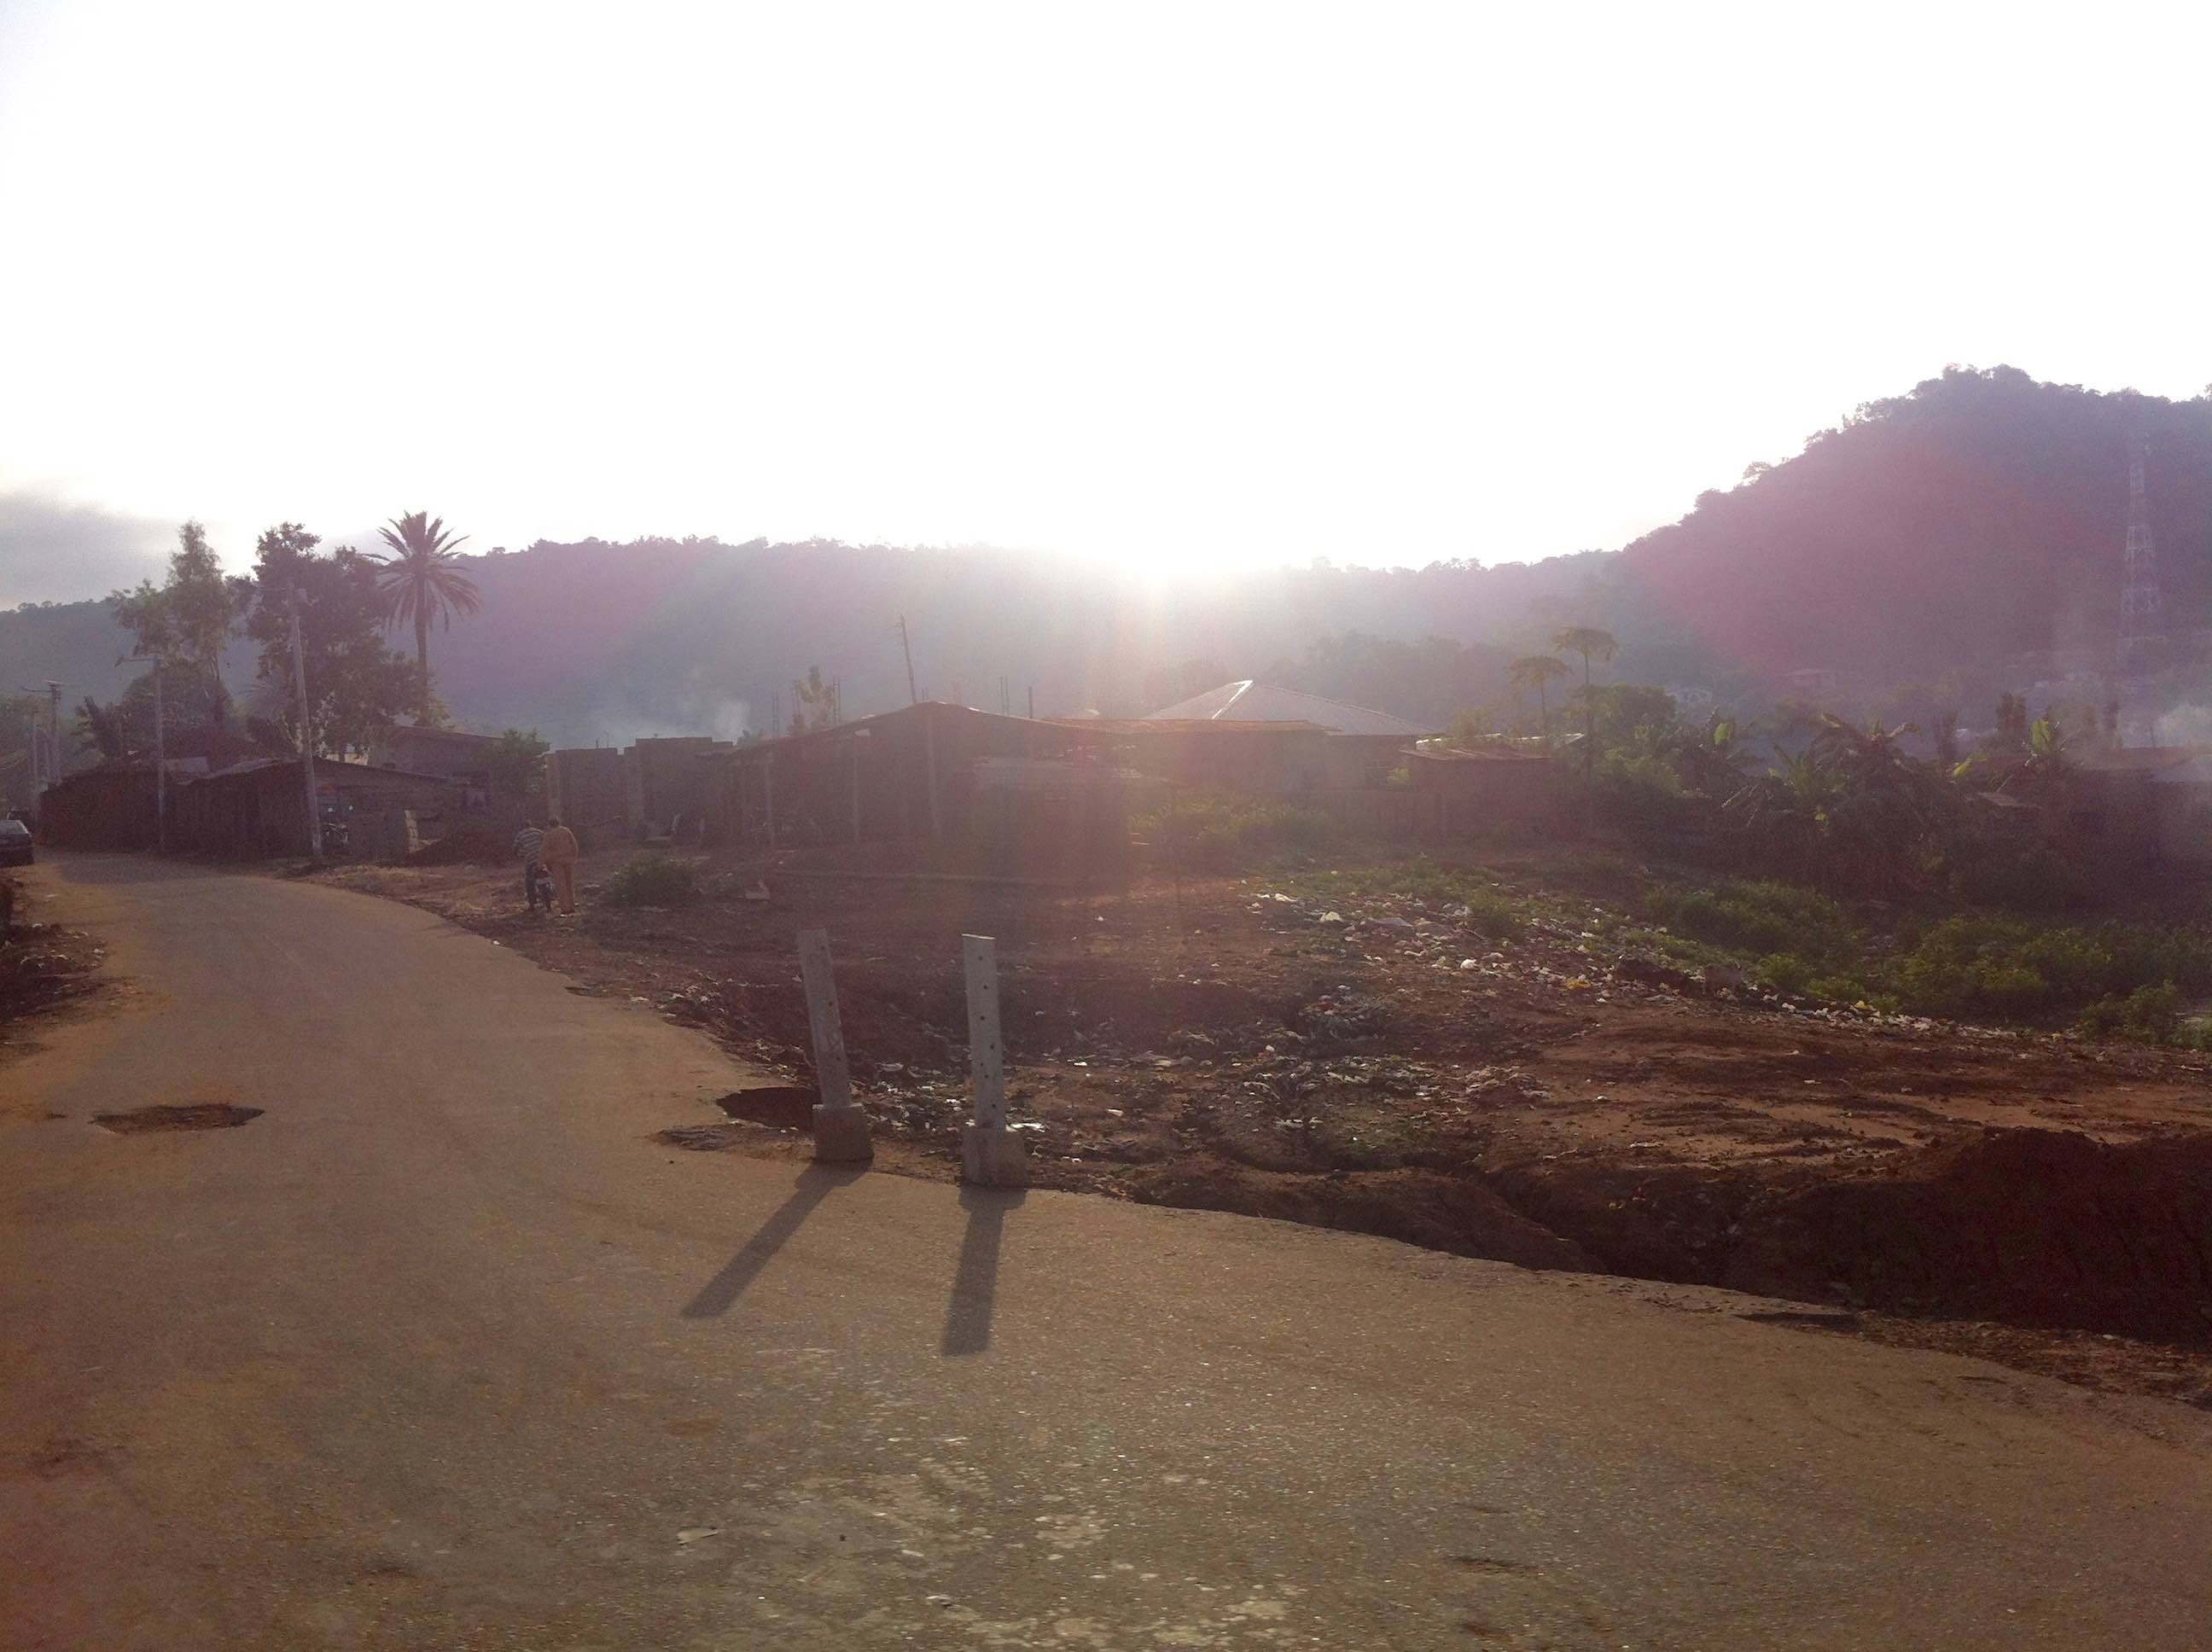 Sunrise in Koton-Karifi, Kogi, Nigeria. #JujuFilms